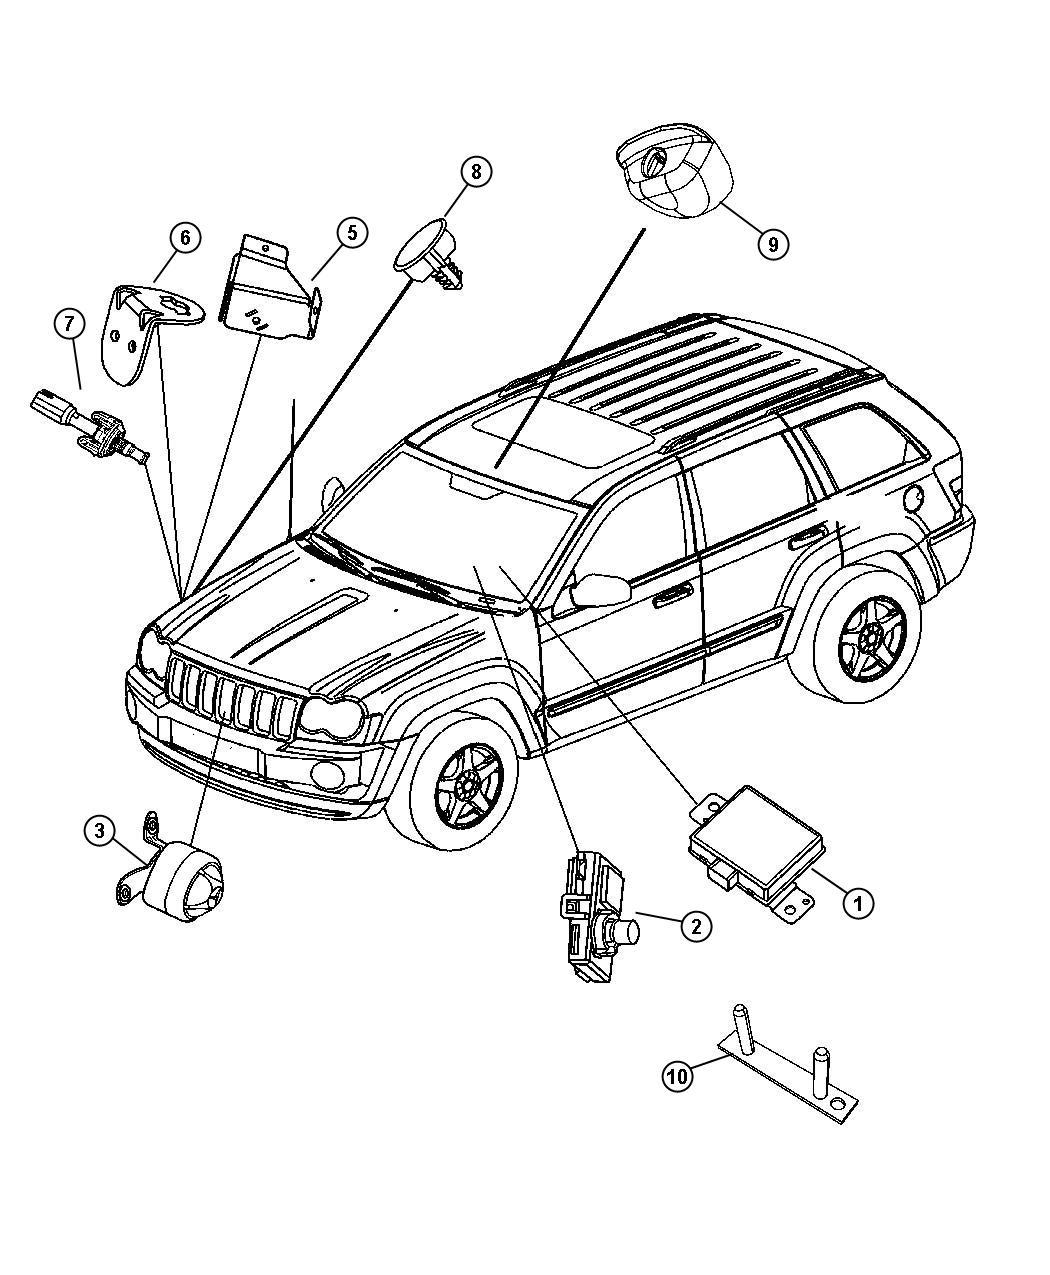 Dodge Caliber Screw. Hex head. M6x16x8.8. Mounting